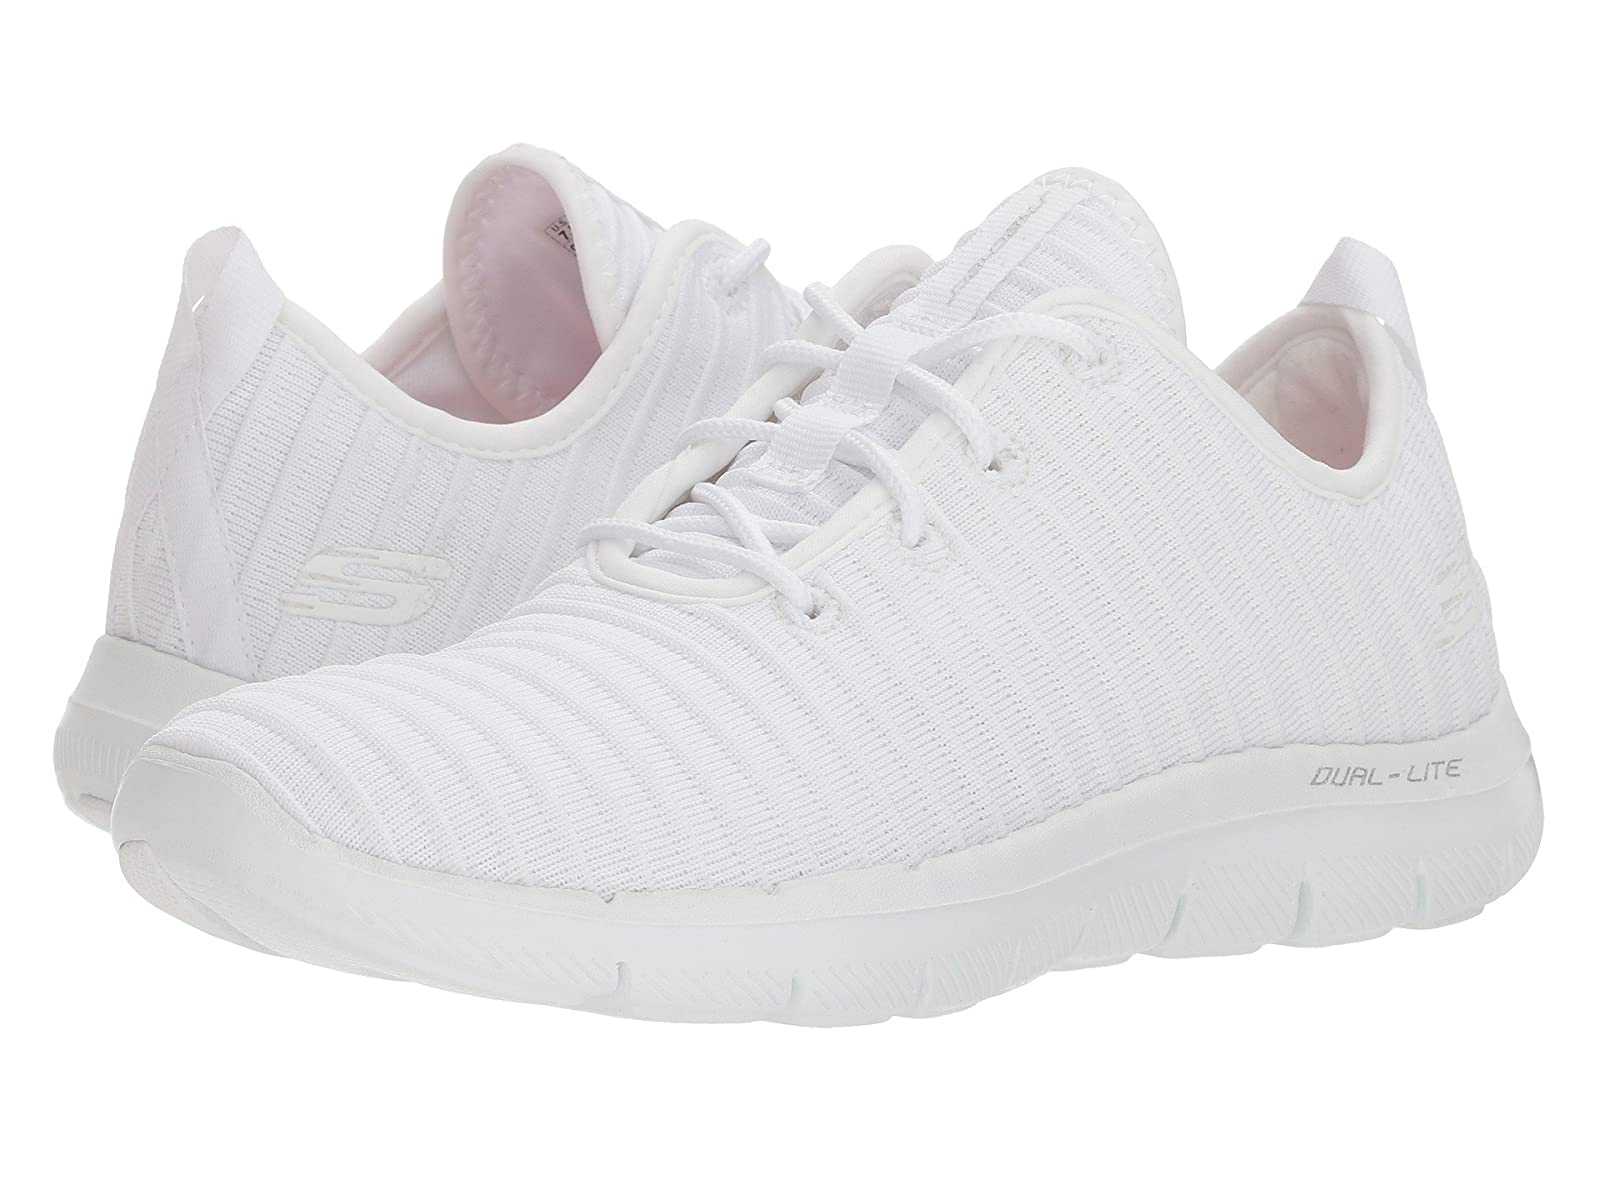 SKECHERS Flex Appeal 2.0 - EstatesCheap and distinctive eye-catching shoes